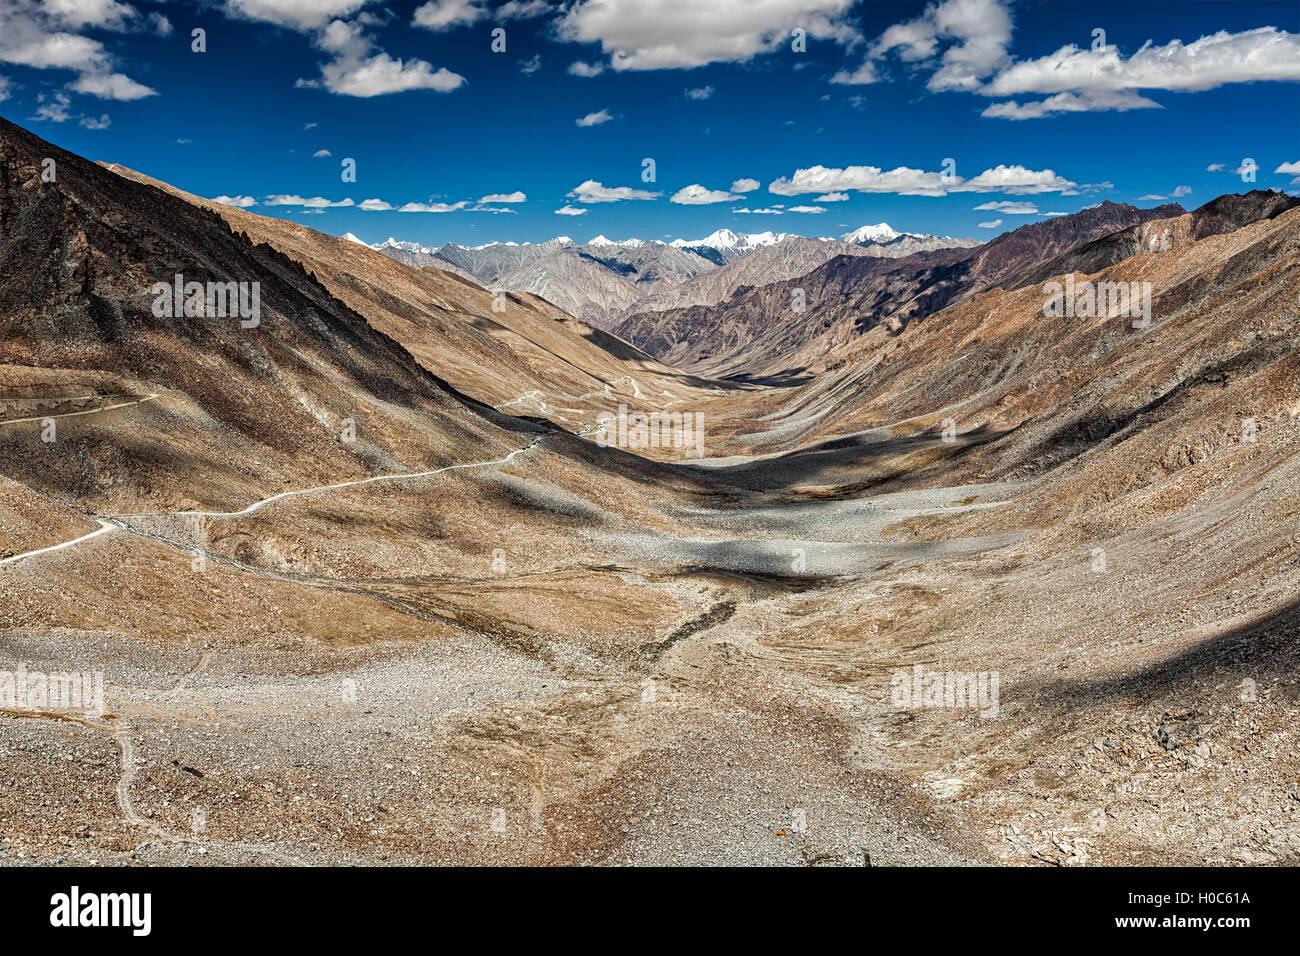 View of Karakoram range and road in valley in Himalayas - Stock Image